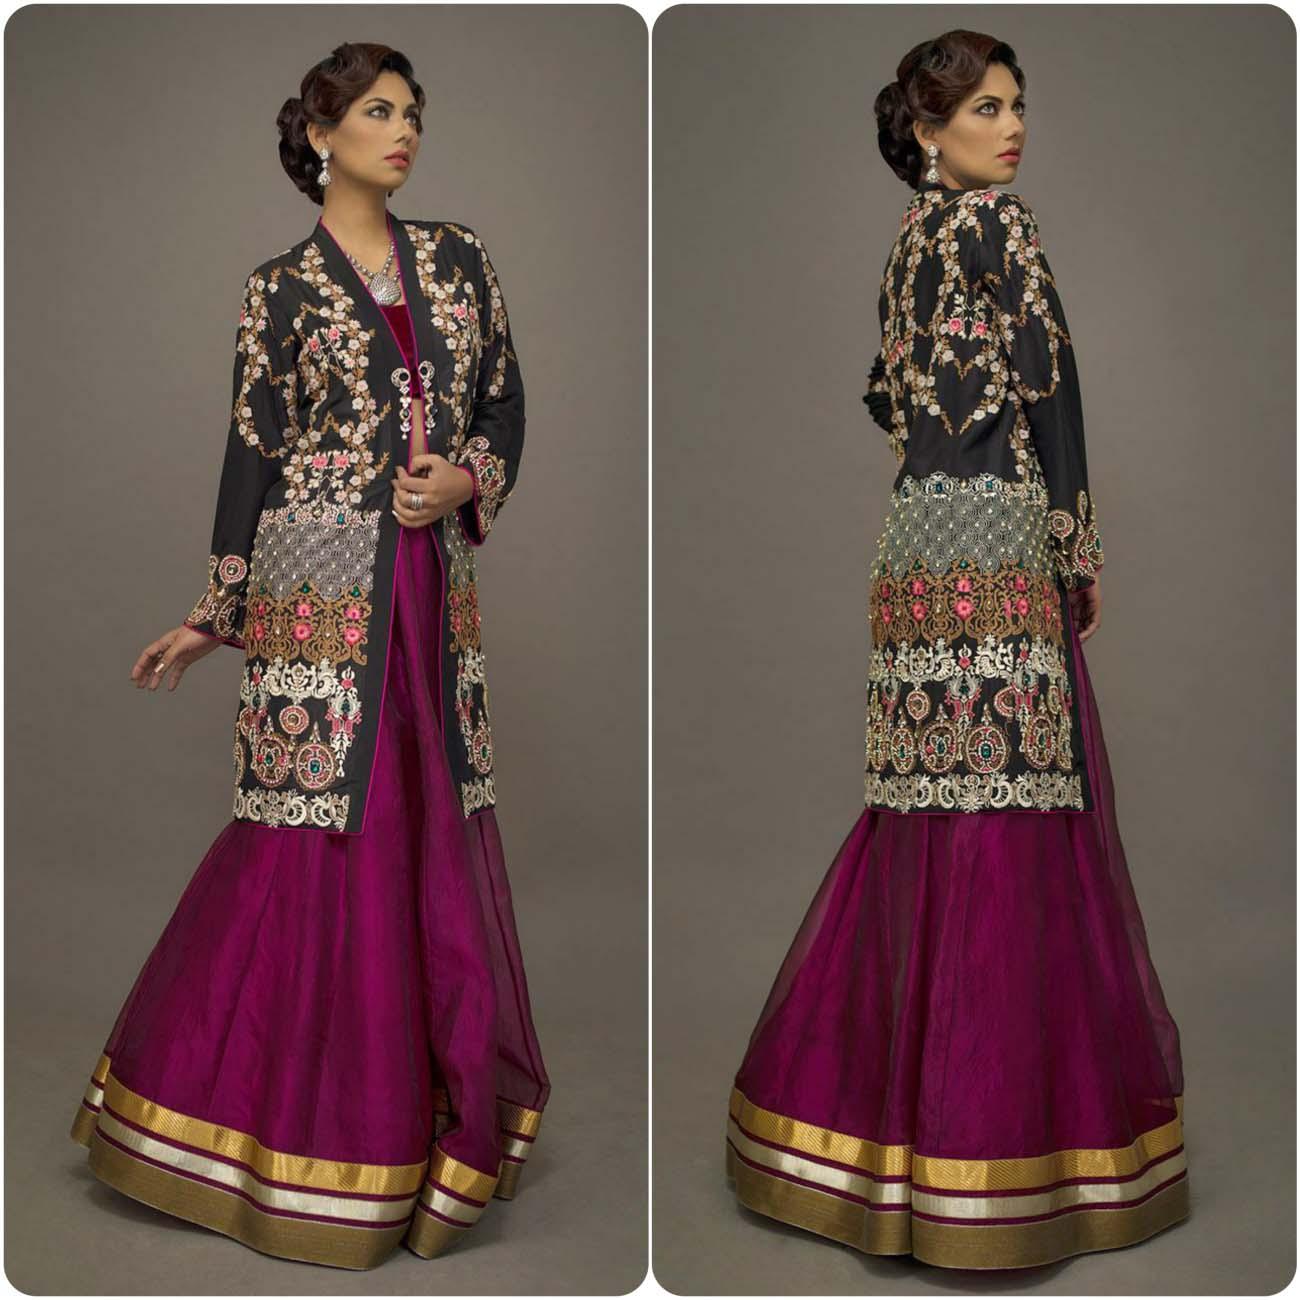 Deepak perwani Wedding Dresses Collection Fo Women 2016-2017...styloplanet (19)